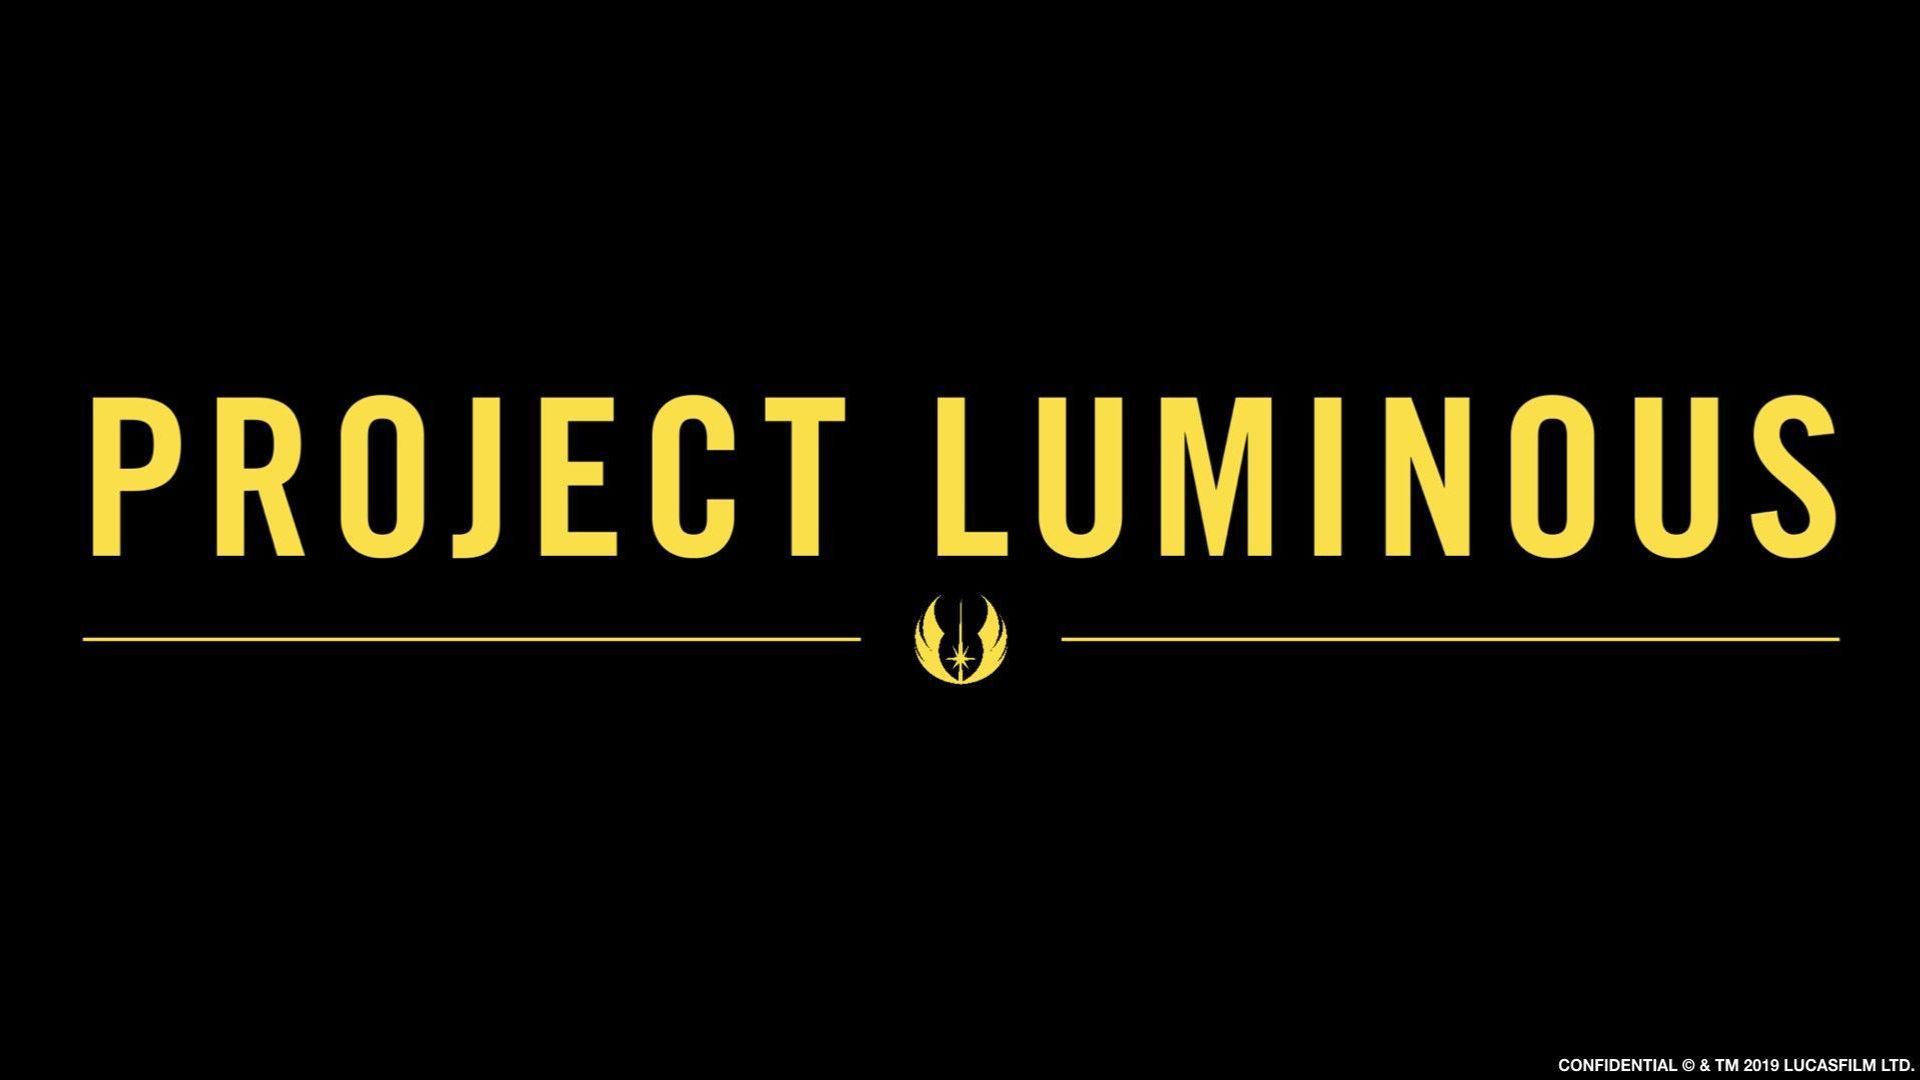 project luminous new start wars announcement banner